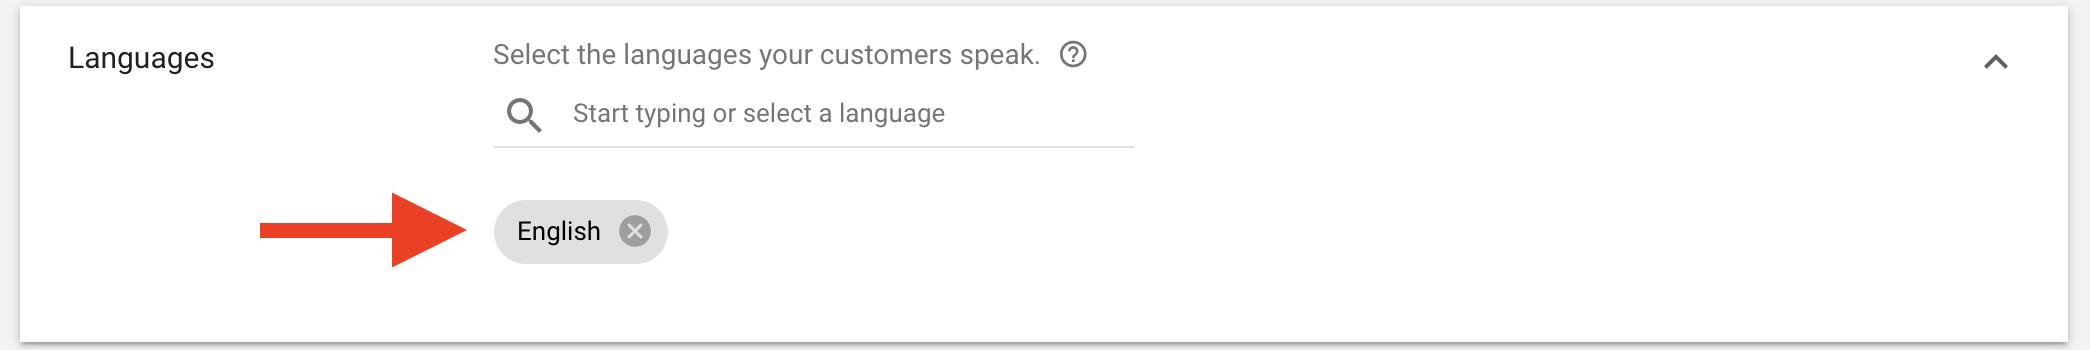 9 Include languages spoken